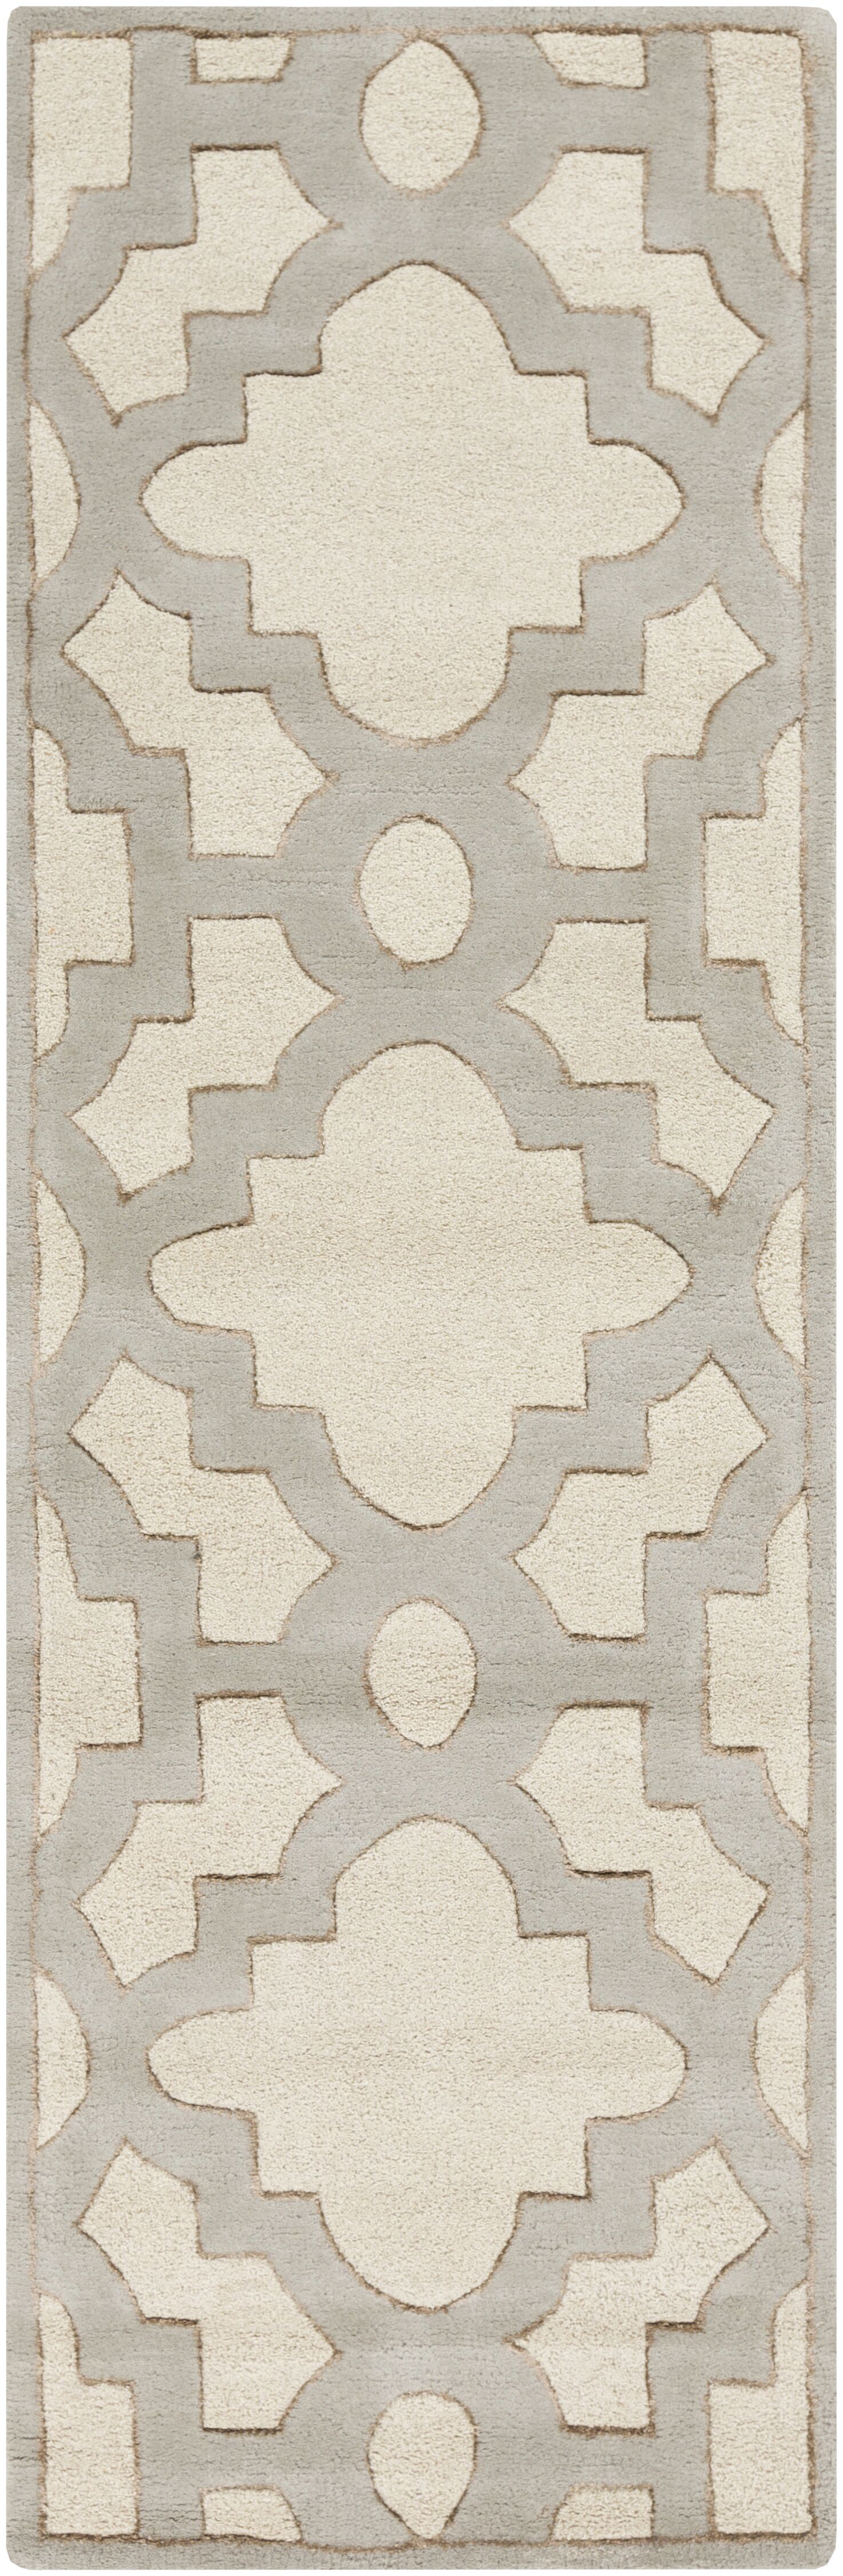 Laurita Hand-Tufted Cream/Gray Area Rug Rug Size: Rectangle 3'3